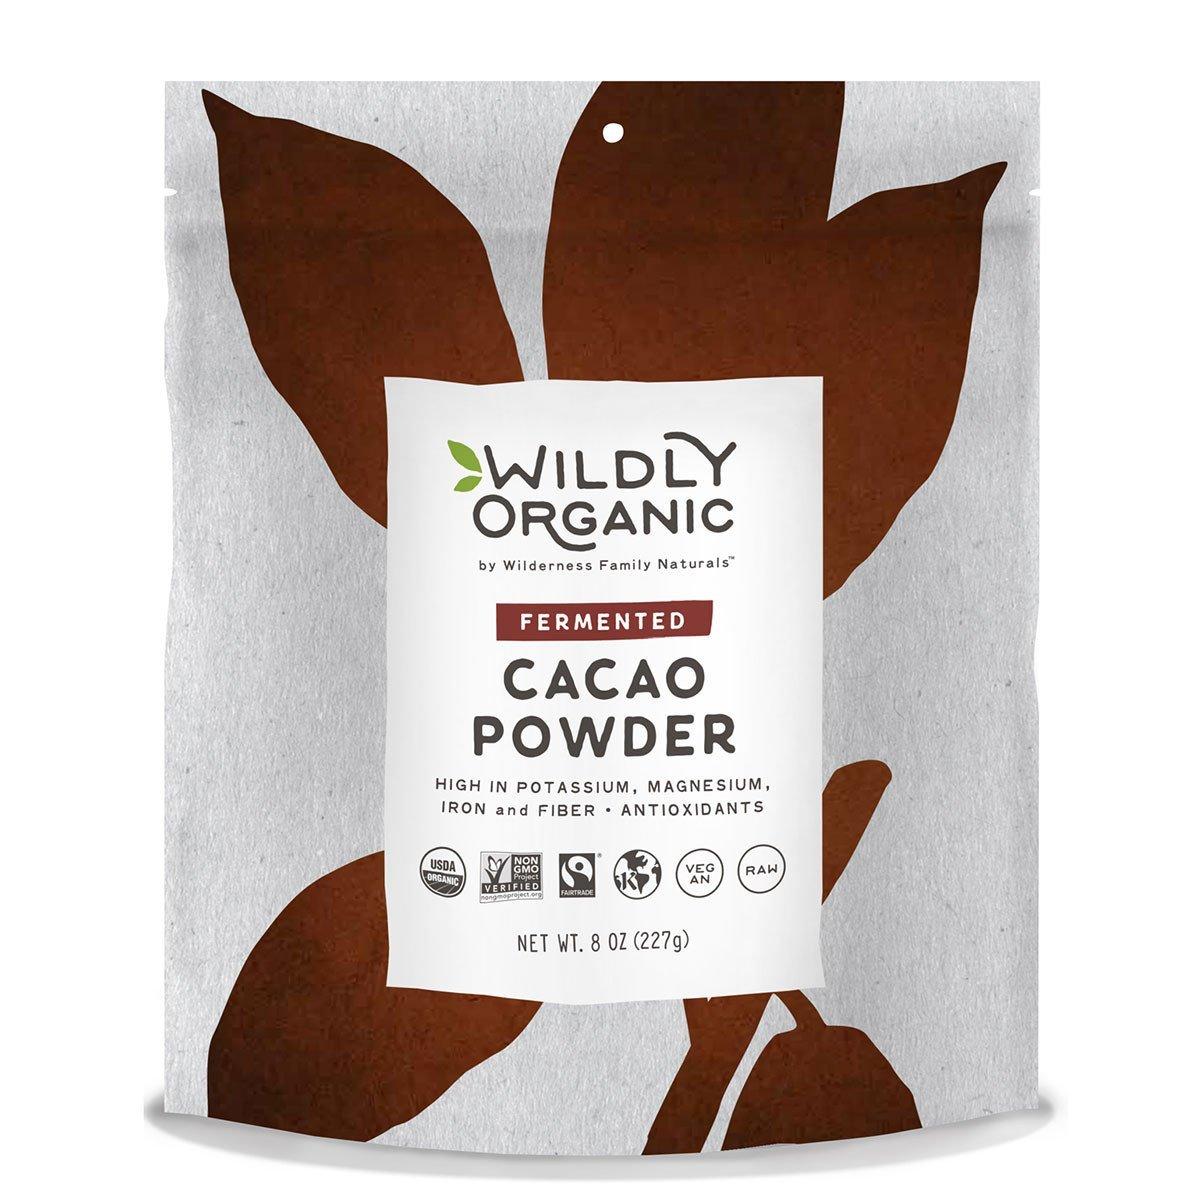 Wildly Organic